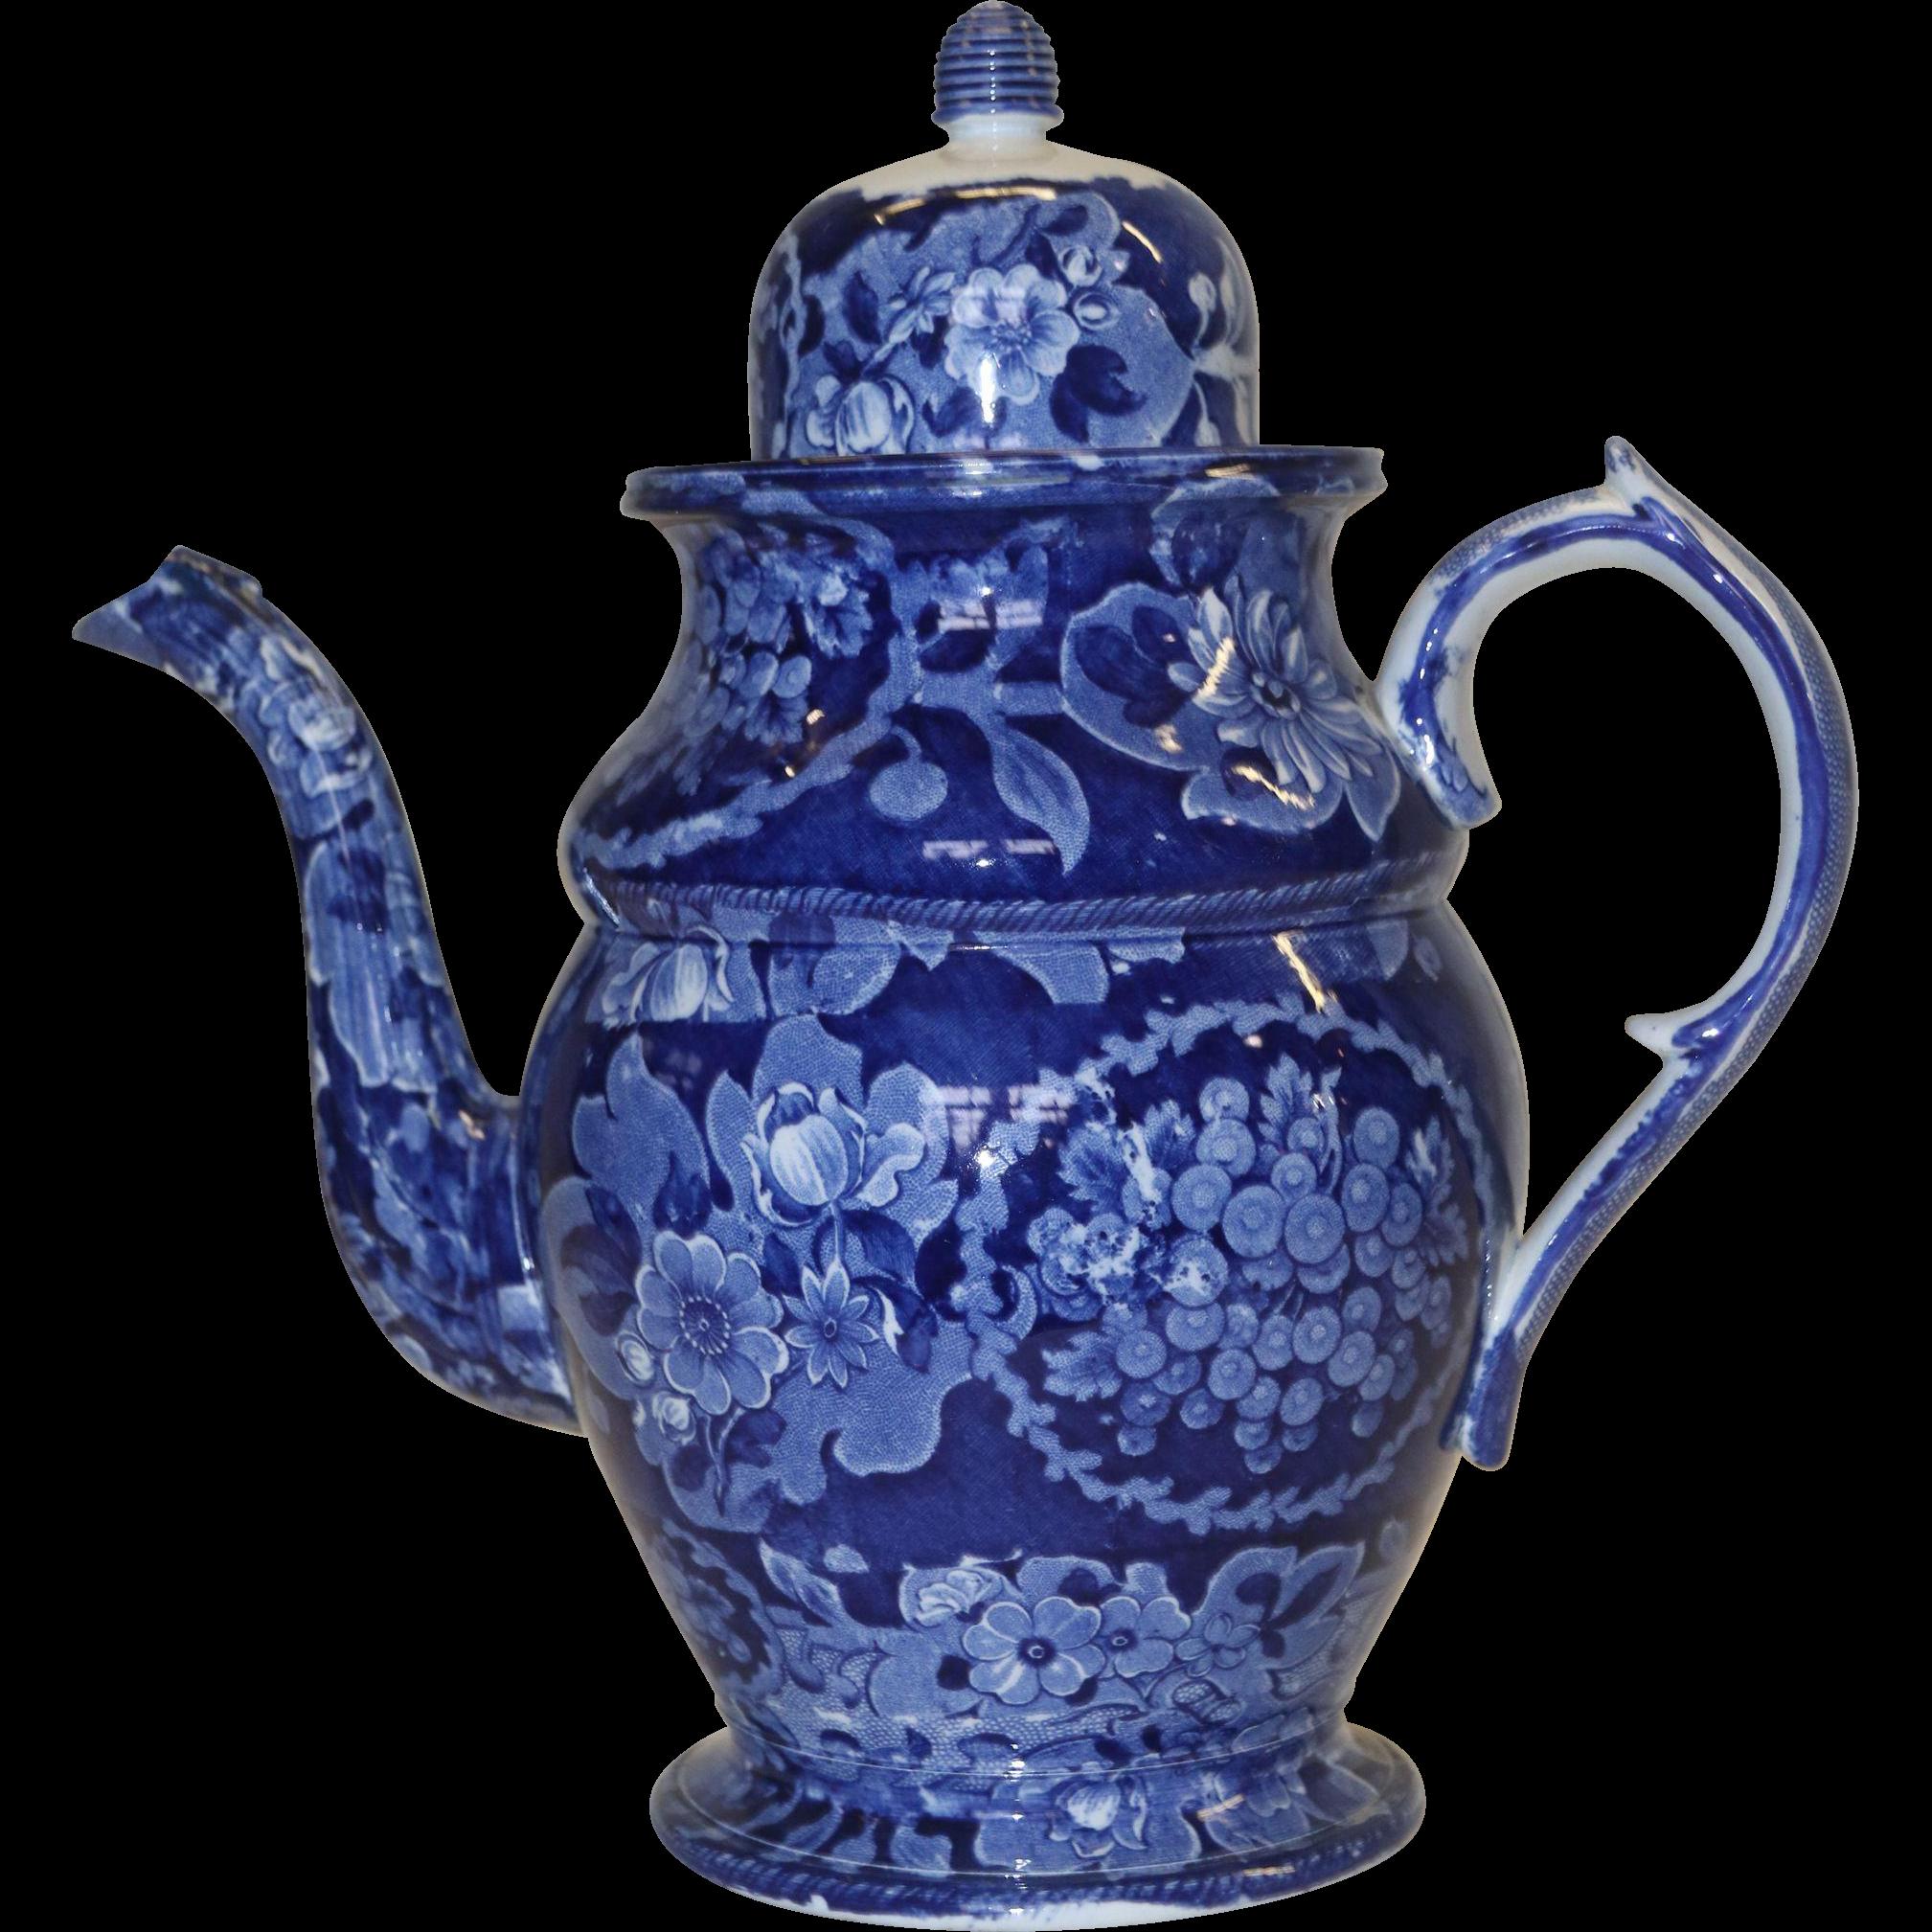 1820's Staffordshire Dark Blue Transferware Coffee Pot